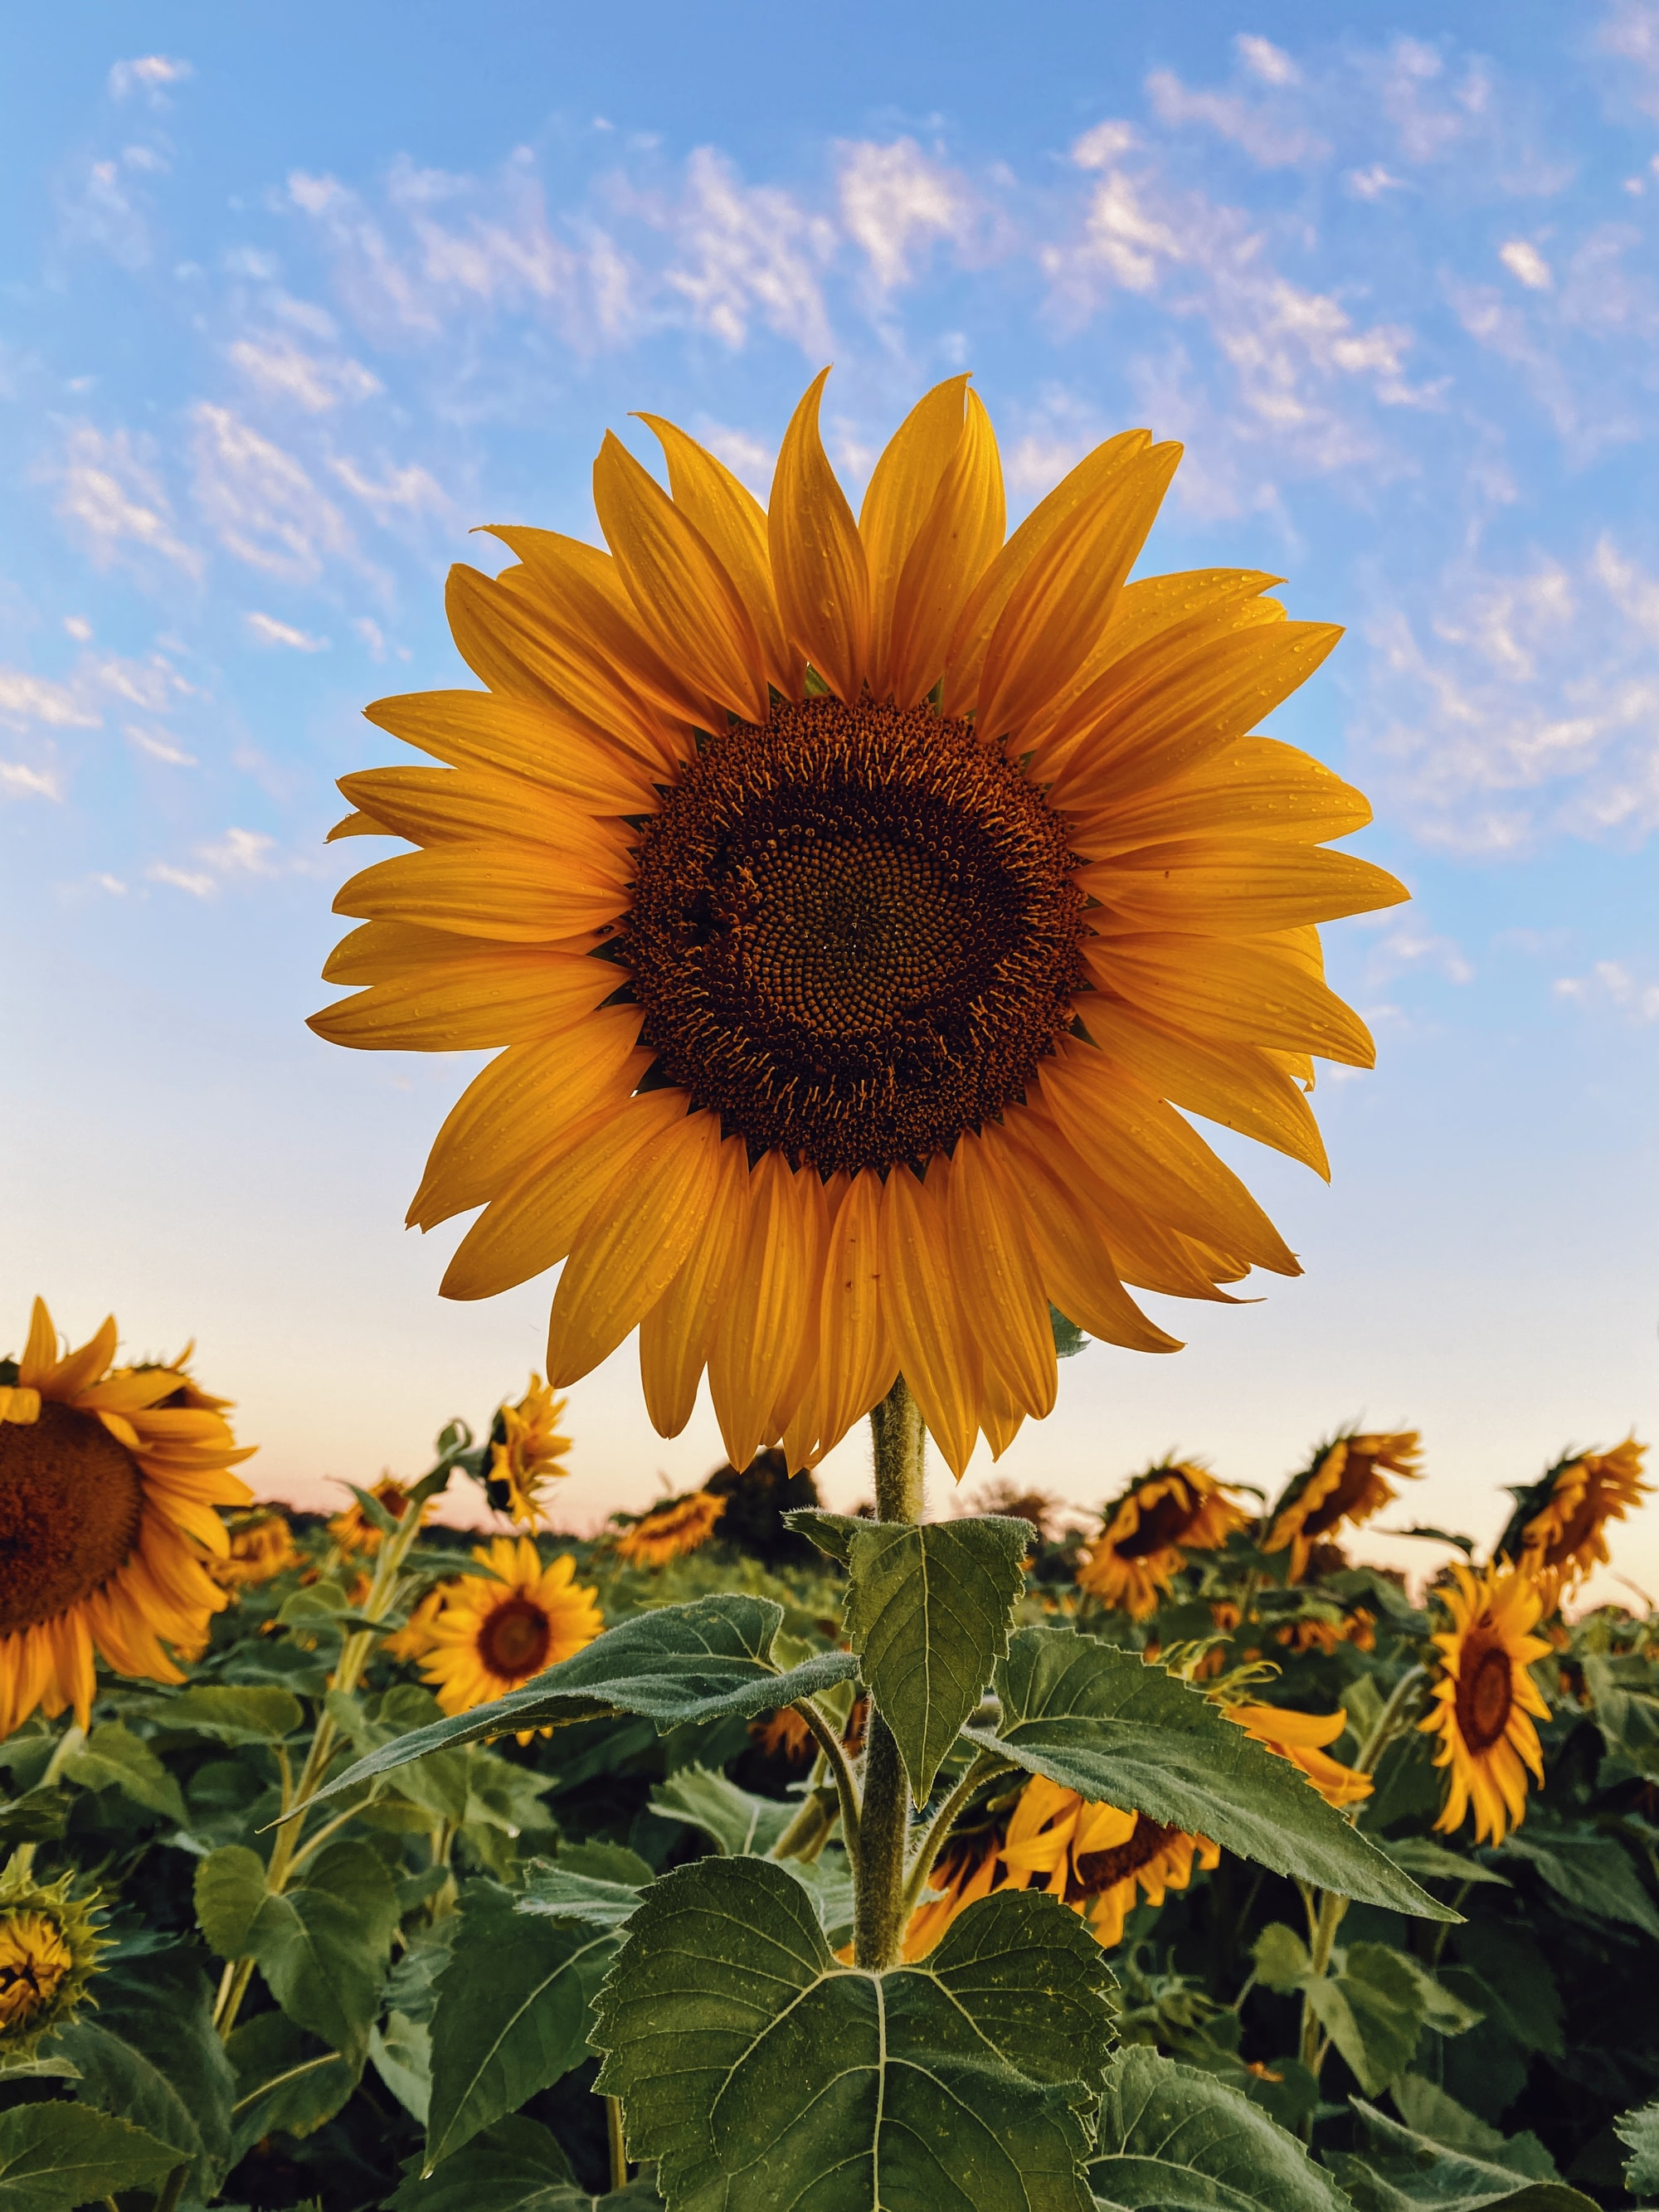 Sunflower lecithin, sunflowers